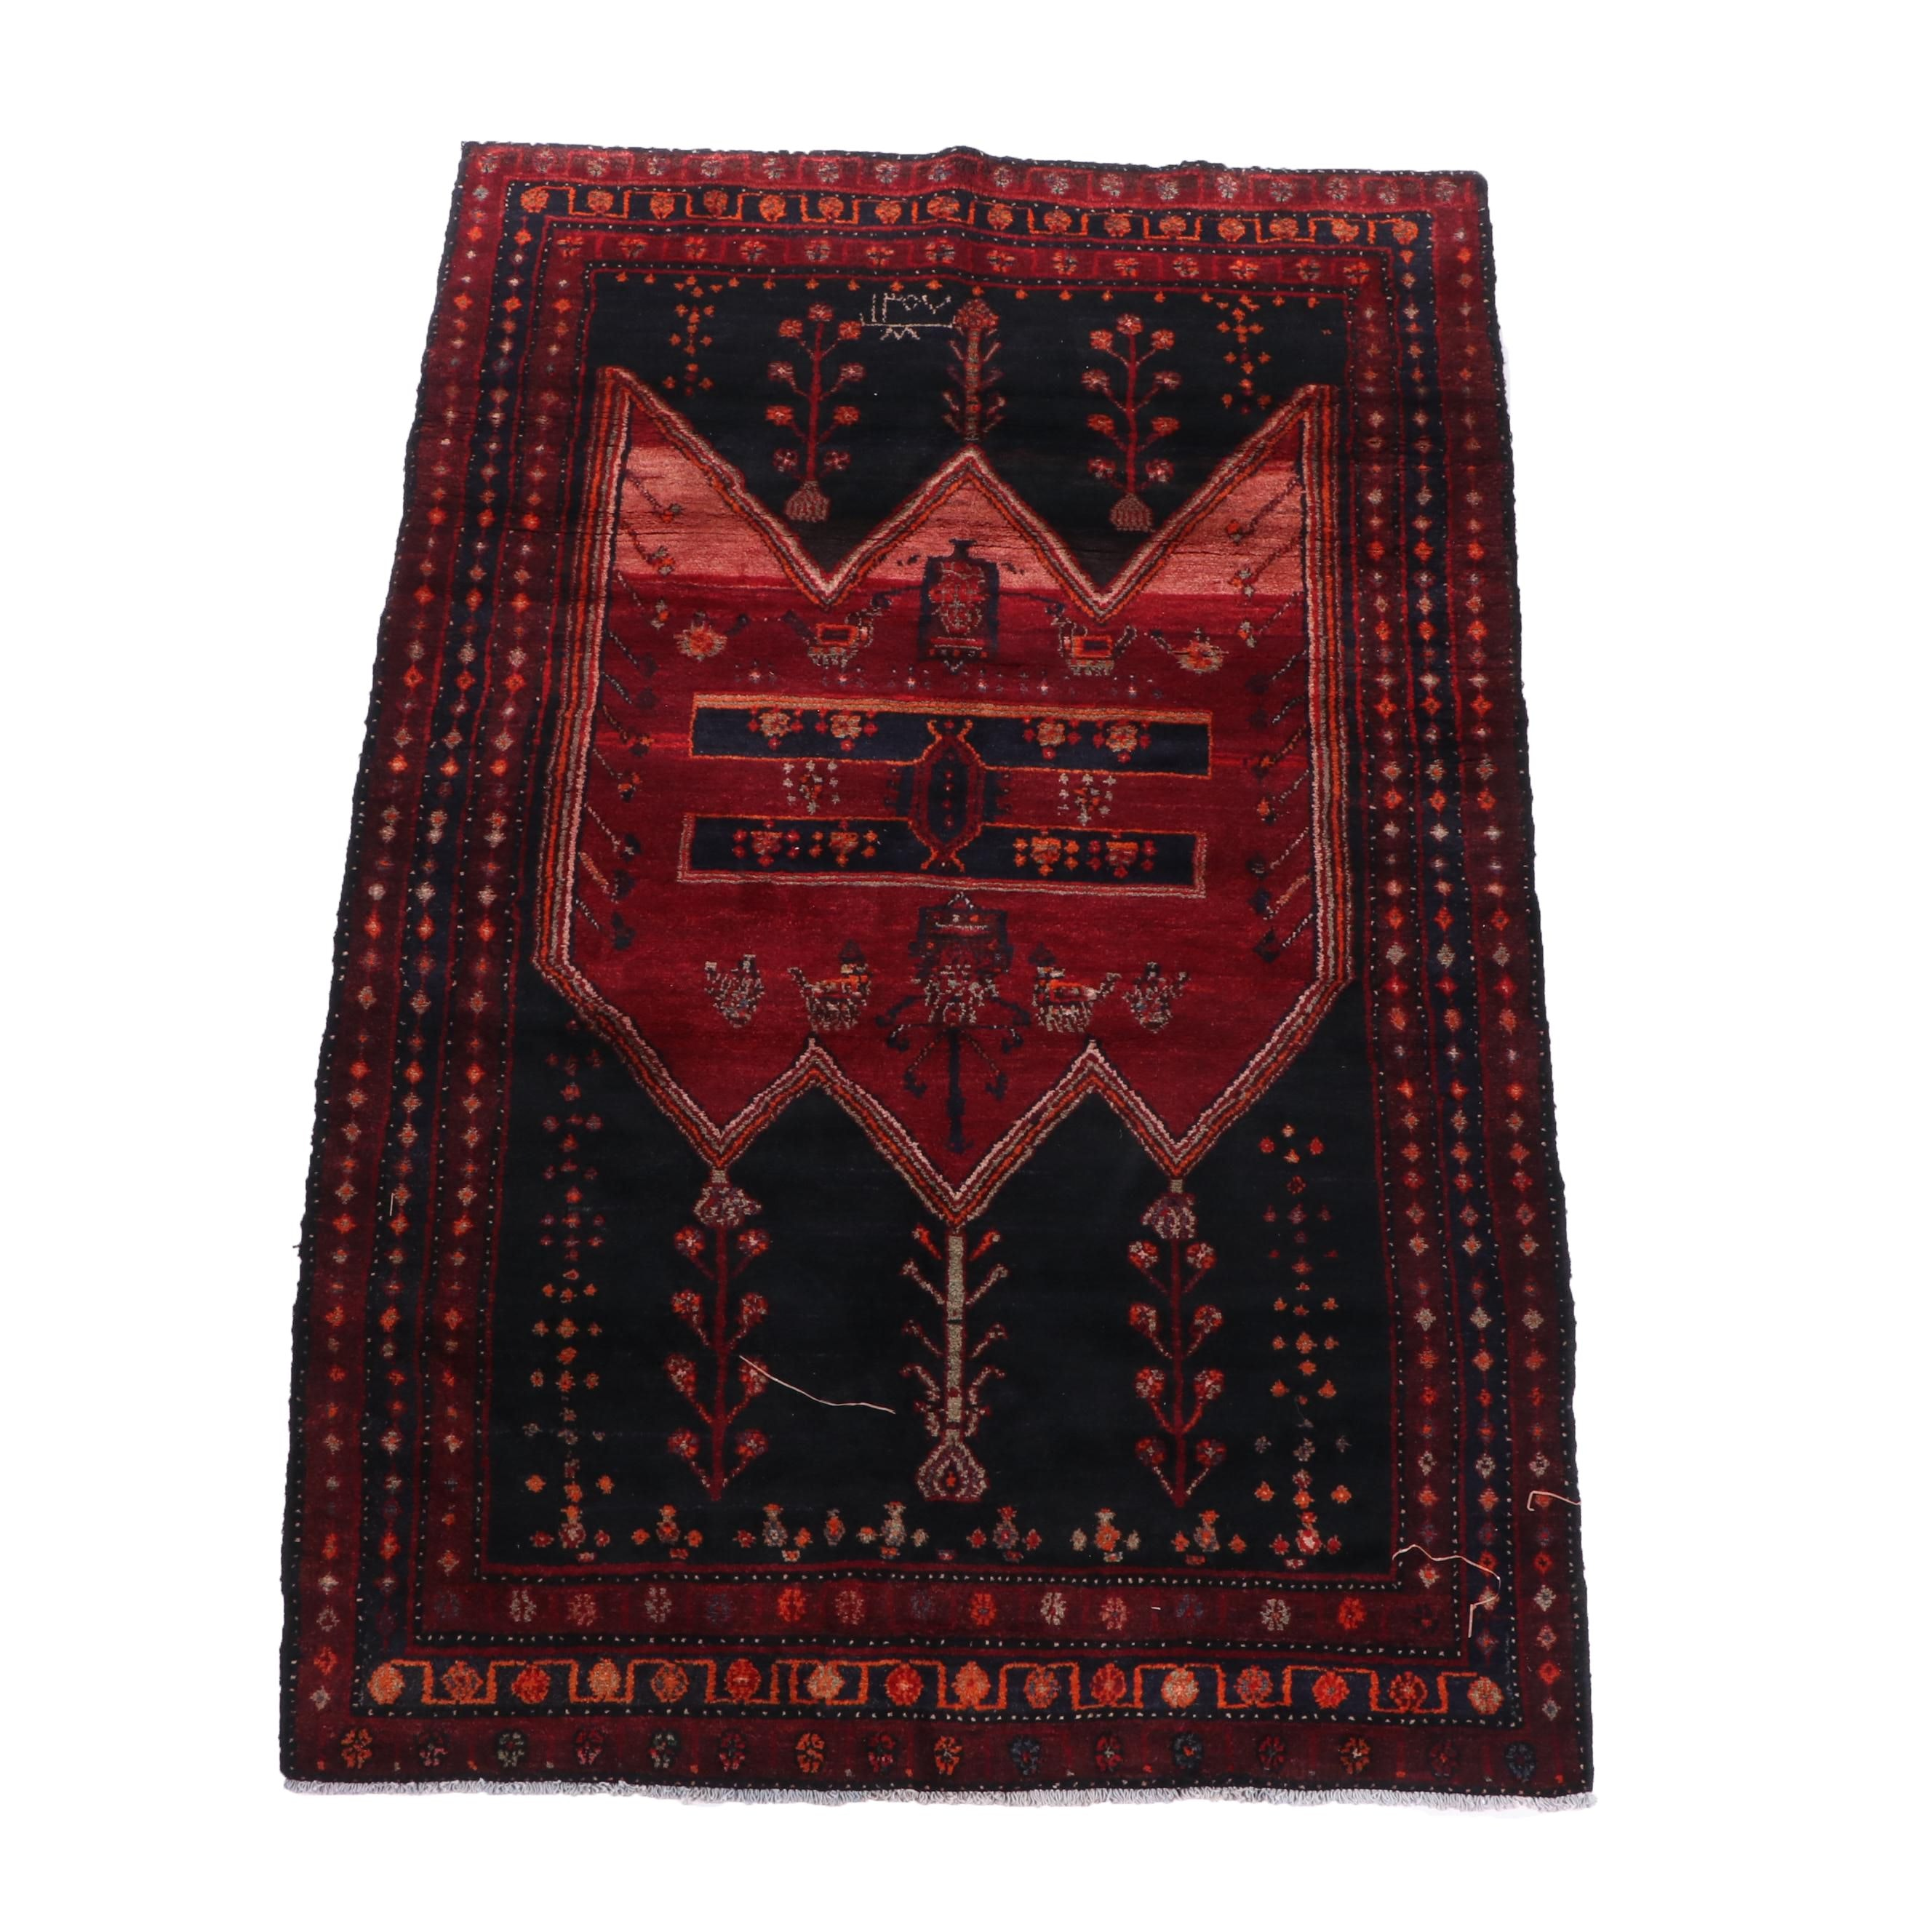 Hand-Knotted Kurdish Kolyai Wool Area Rug